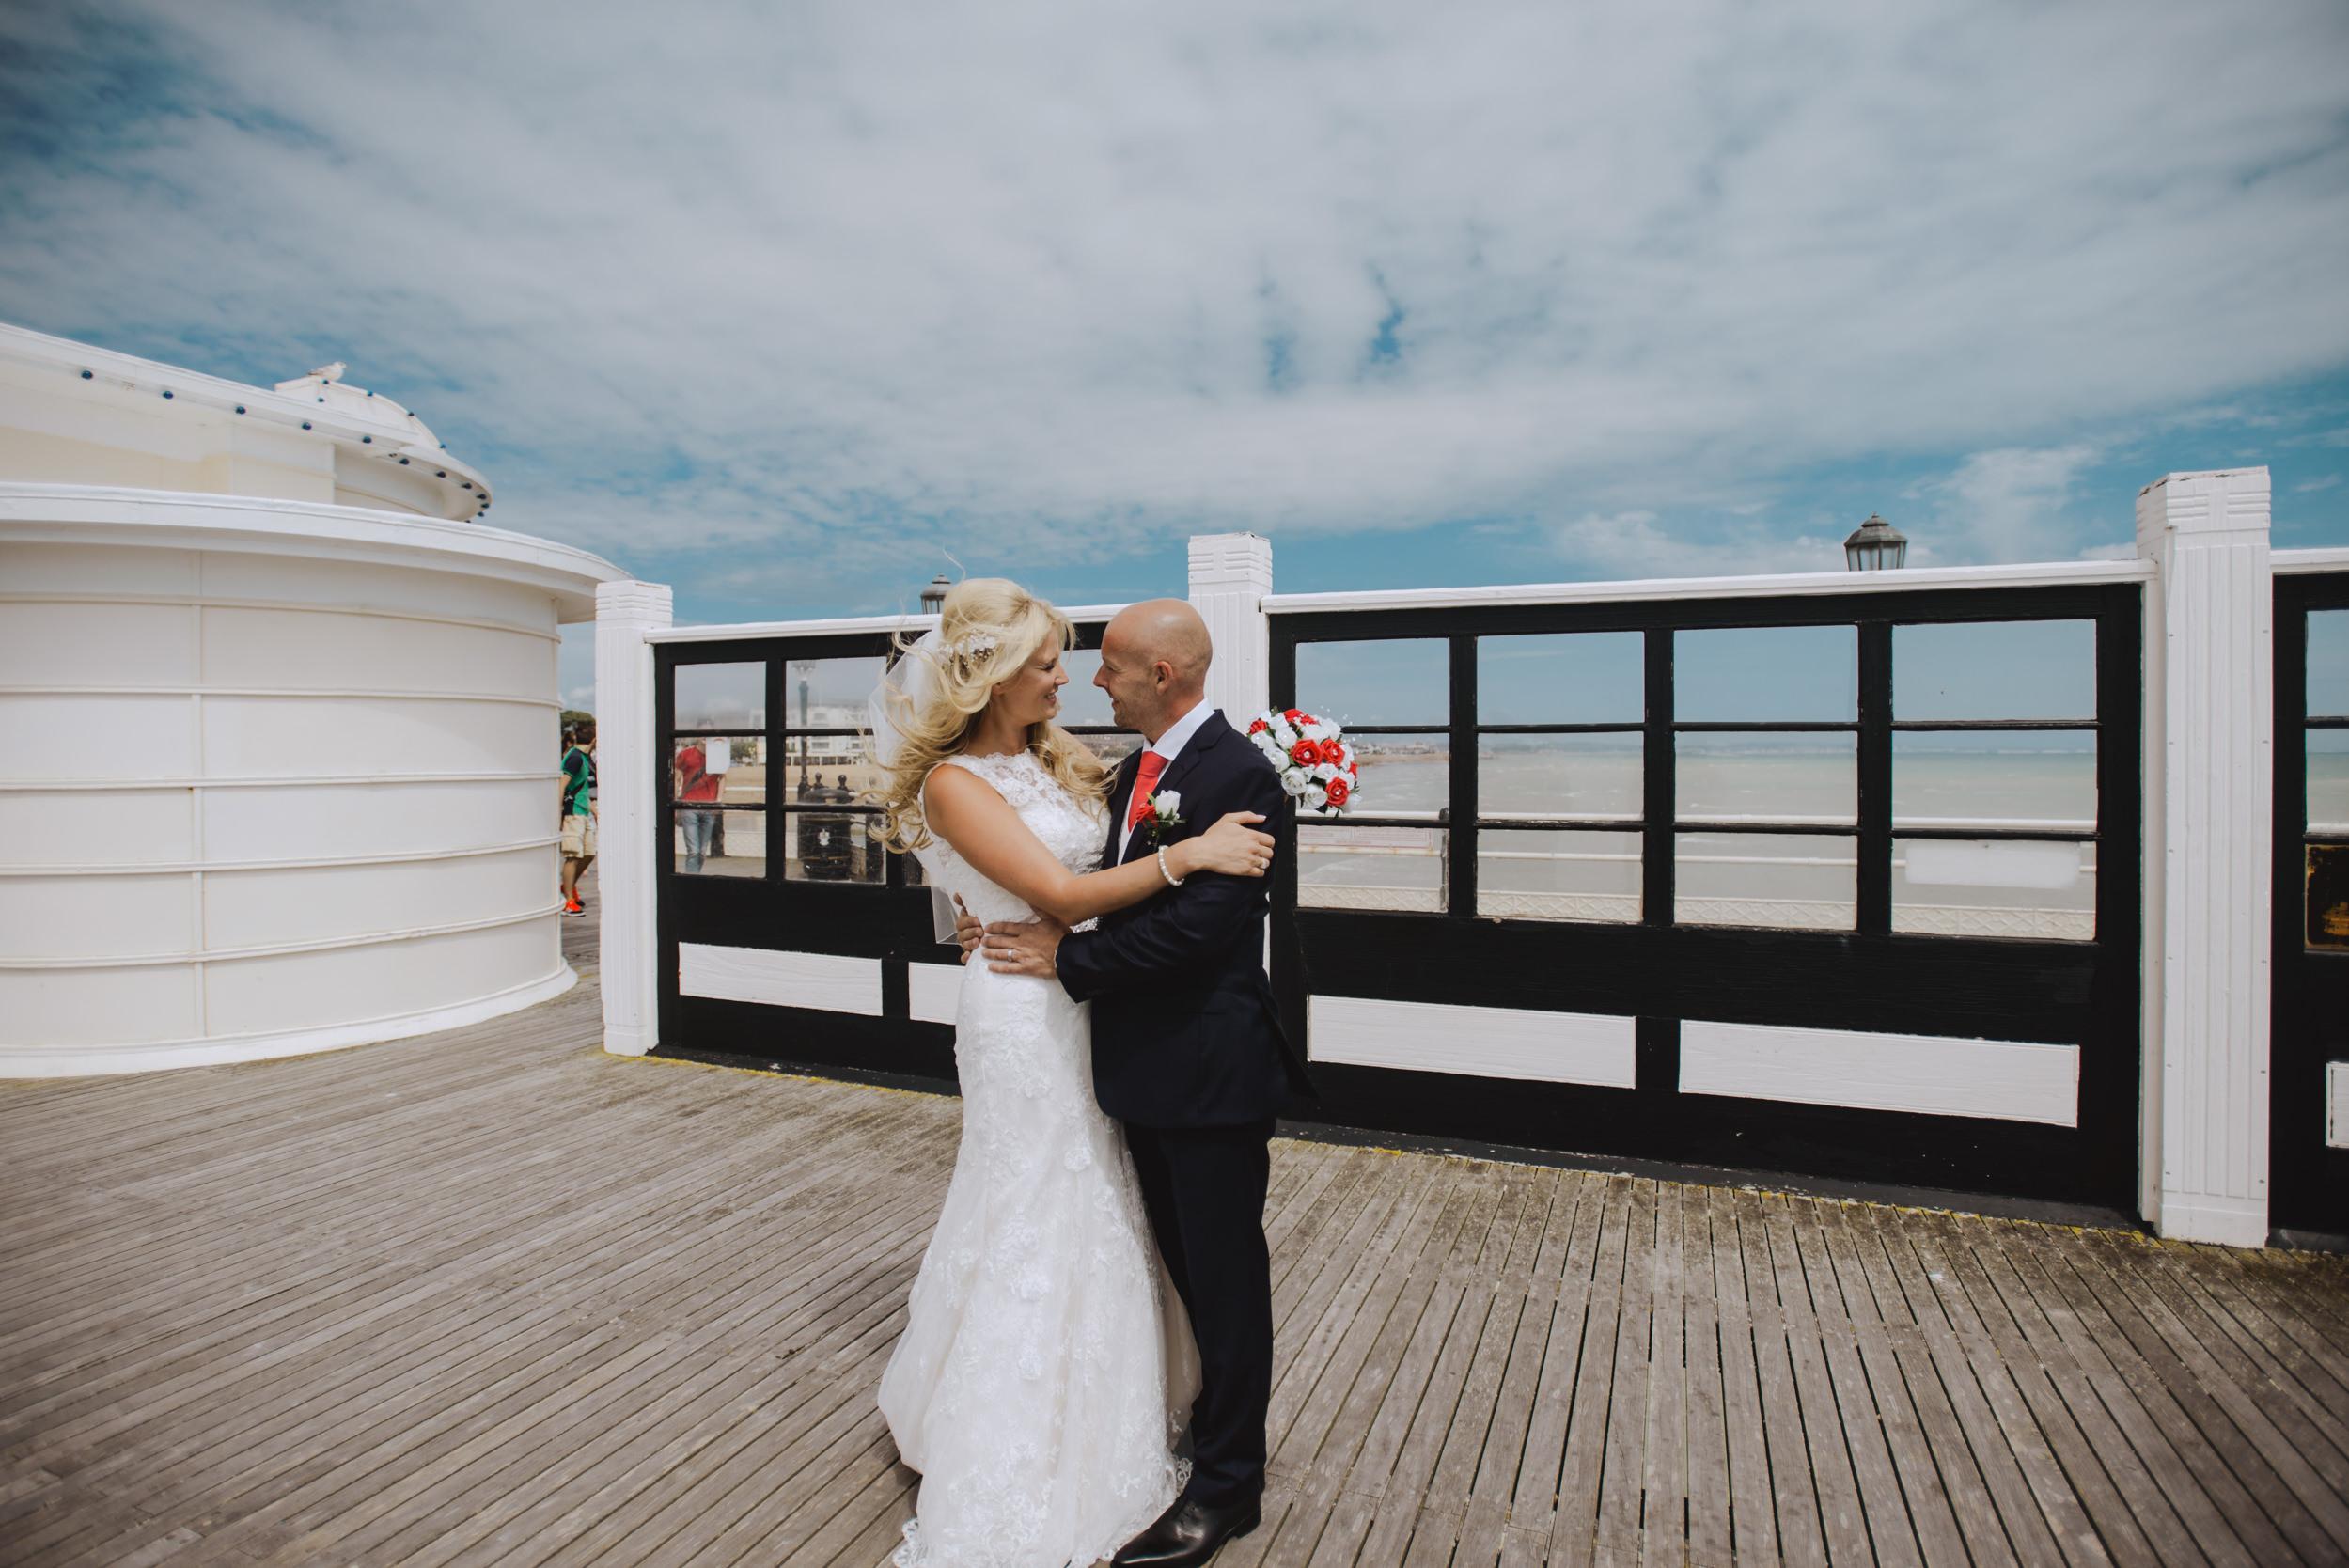 worthing-pier-wedding-007.JPG